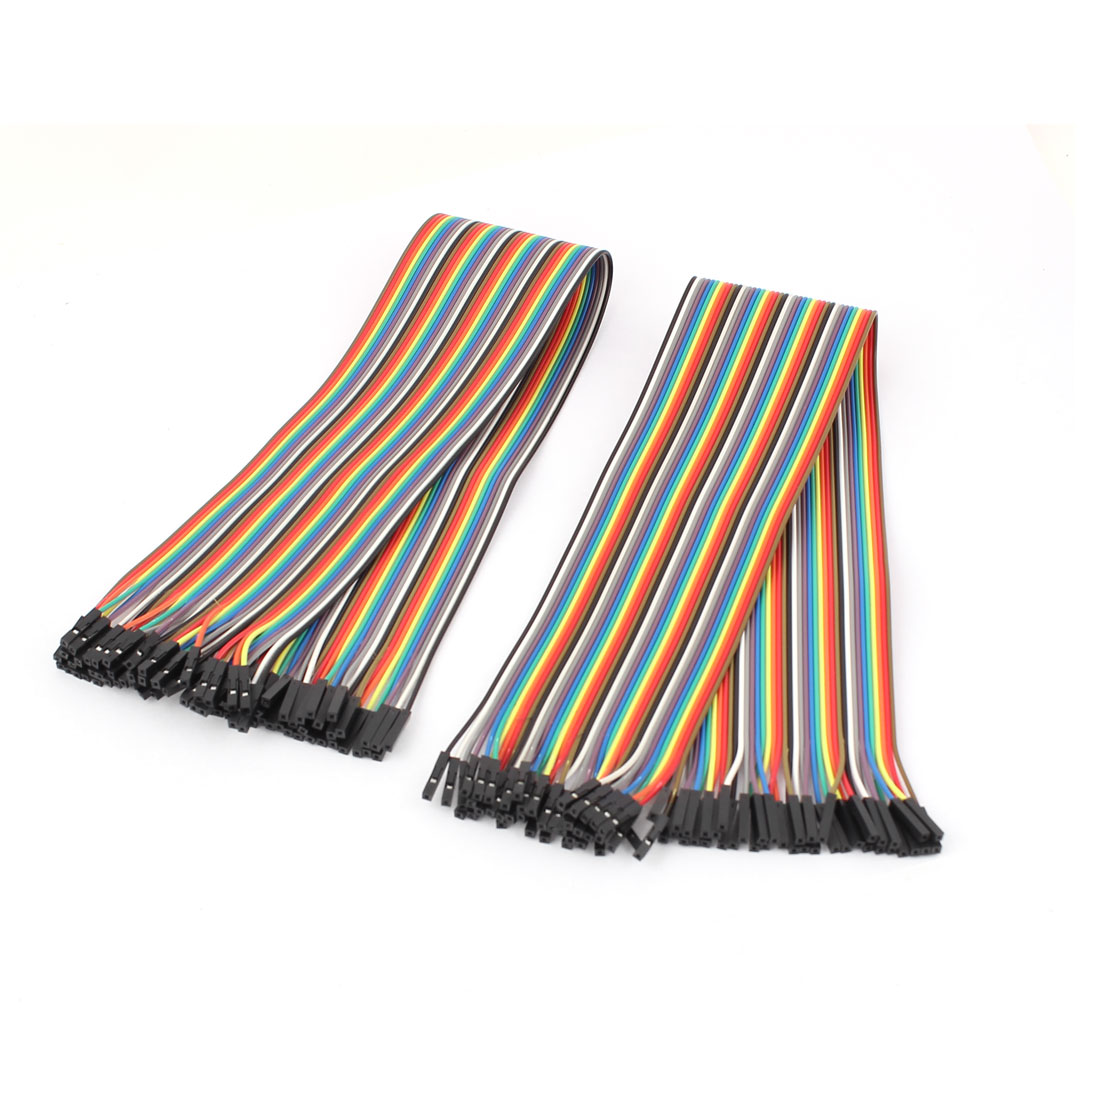 2Pcs 40cm F/F 40P Solderless Colored Flexible Breadboard Jumper Wire